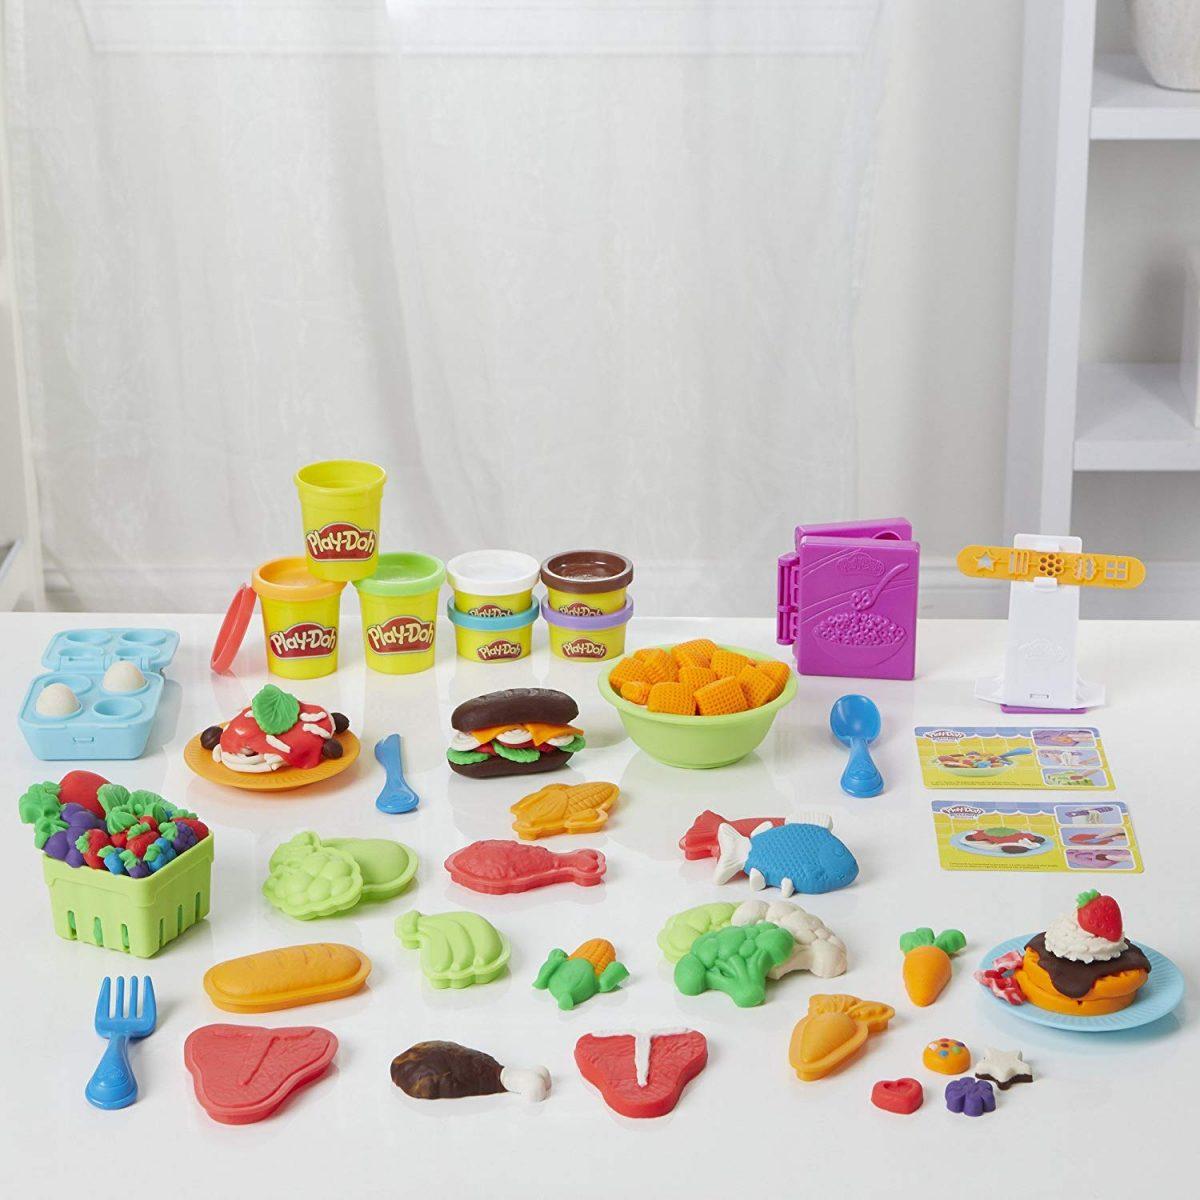 kitchen play doh set